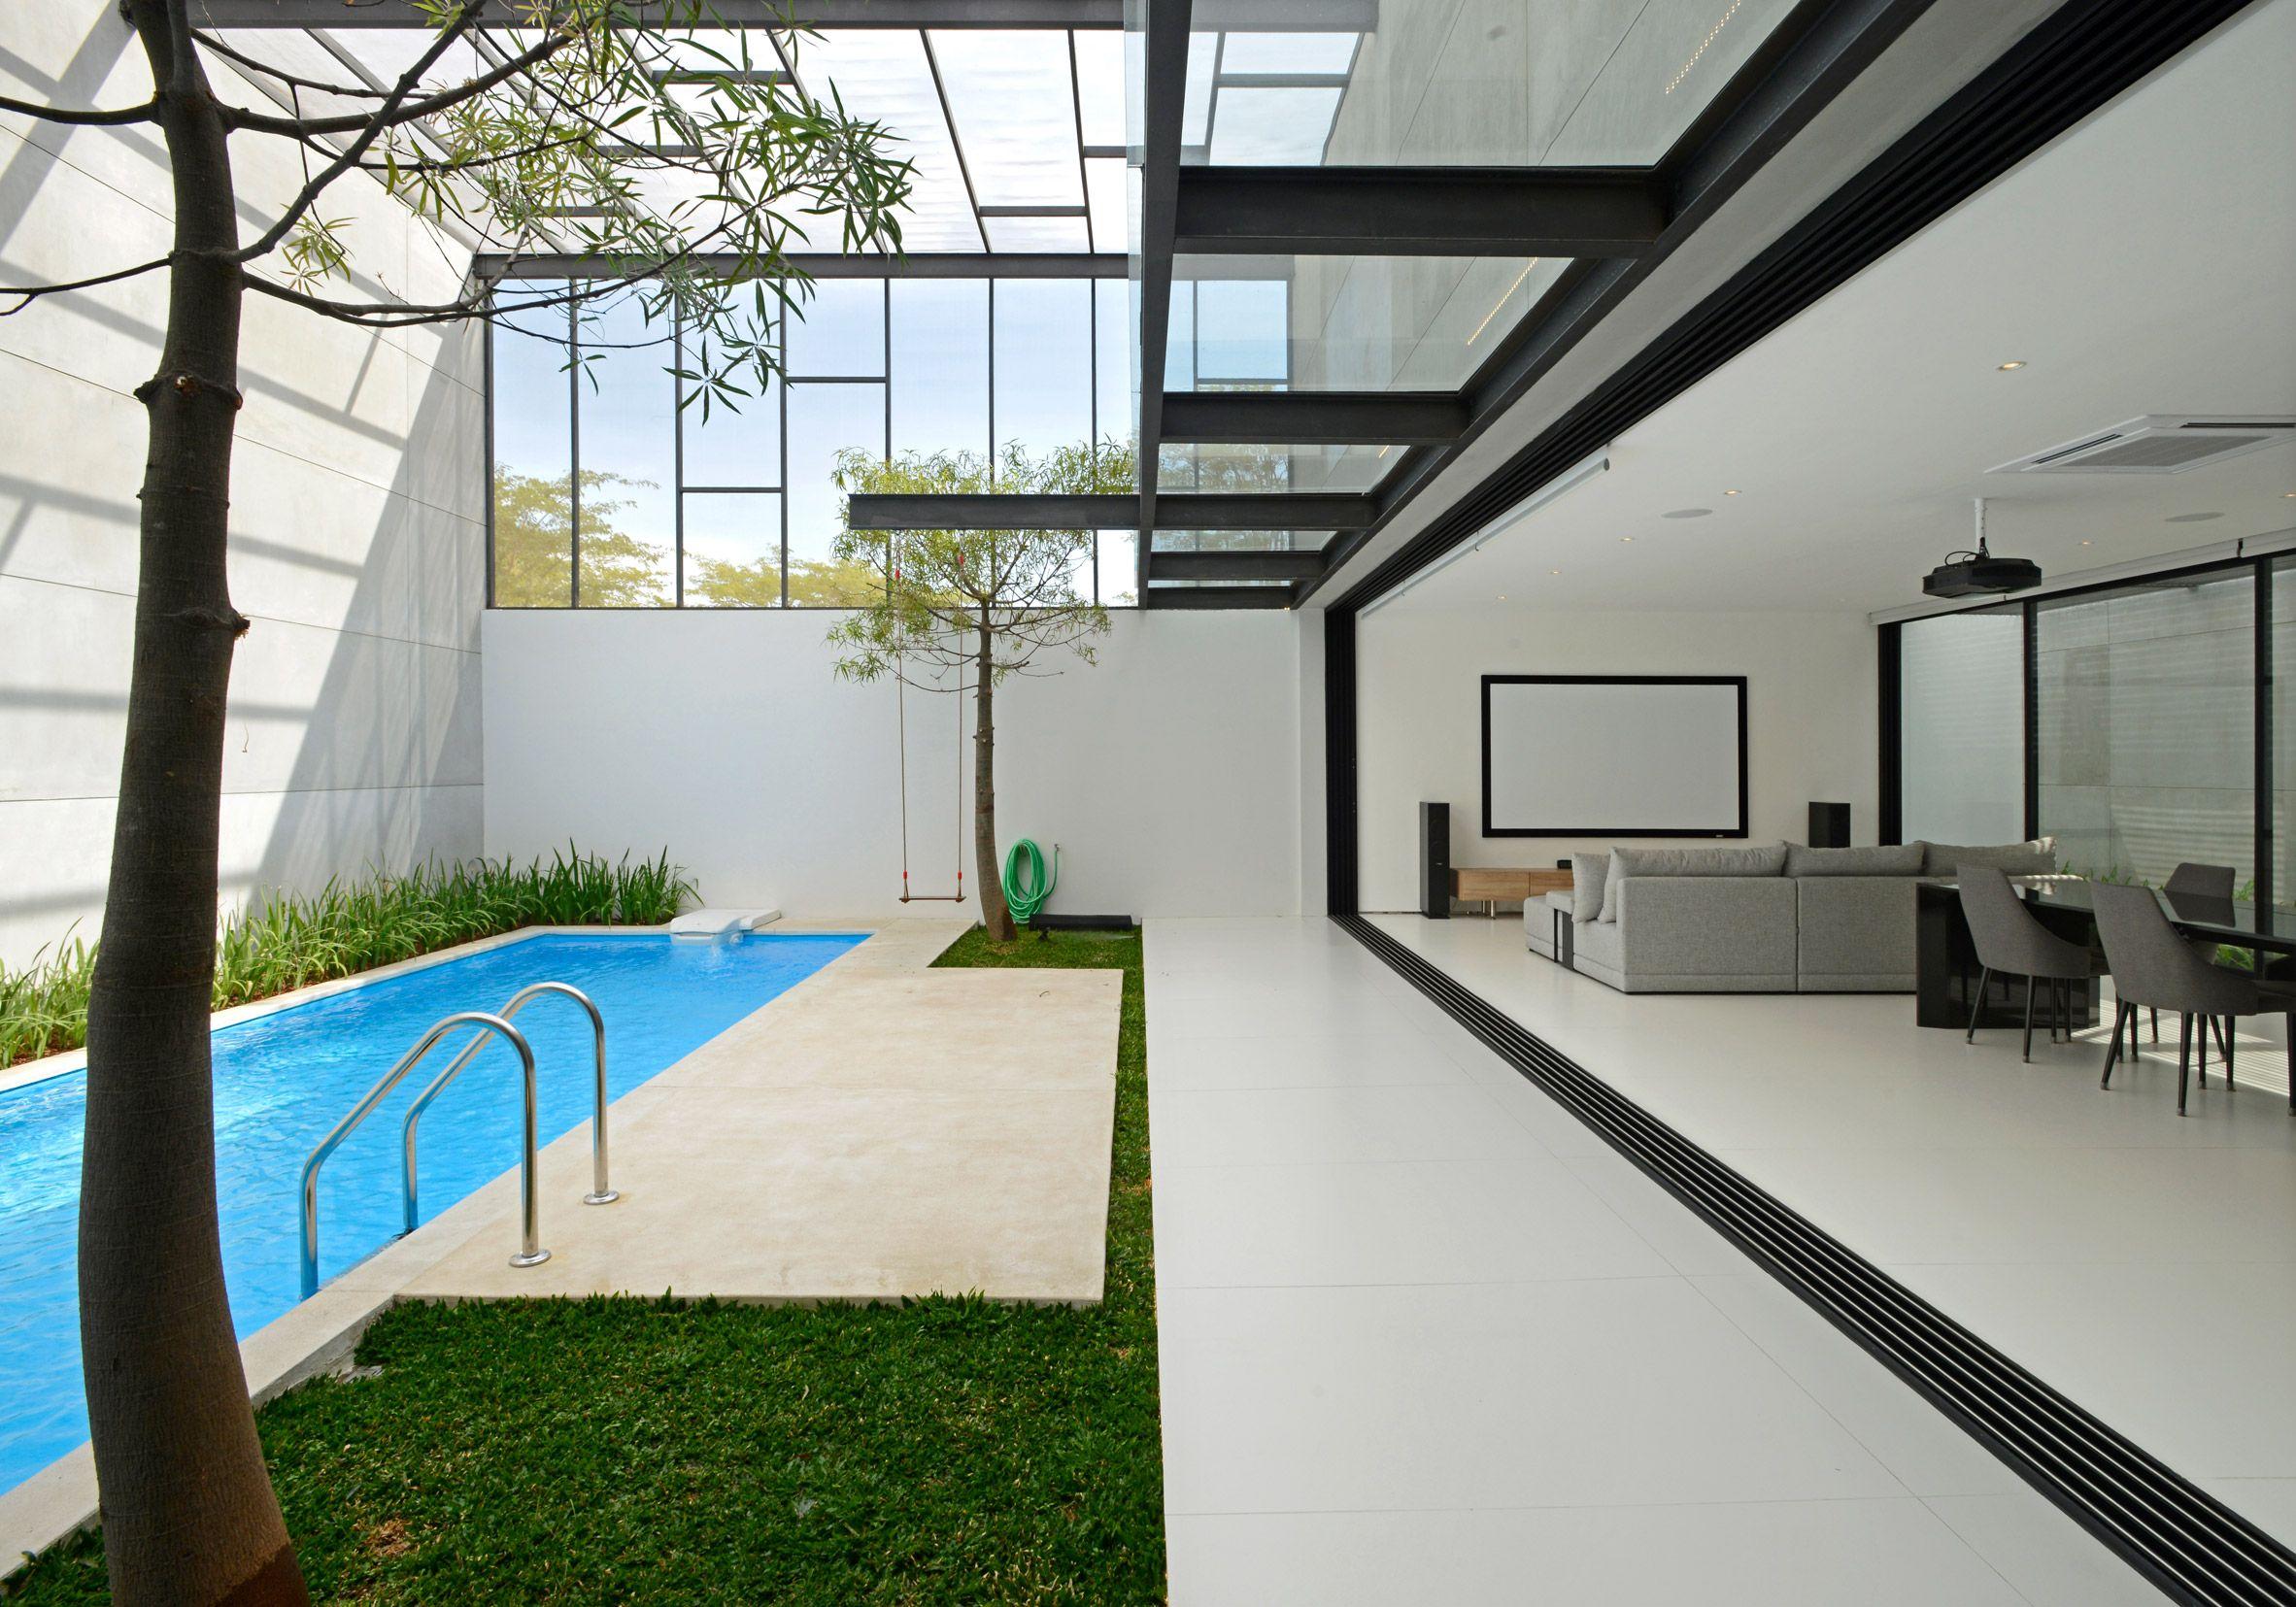 Parallel Concrete Walls Divide Up Jj House By Ivan Priatman Architecture Concrete Wall Internal Courtyard